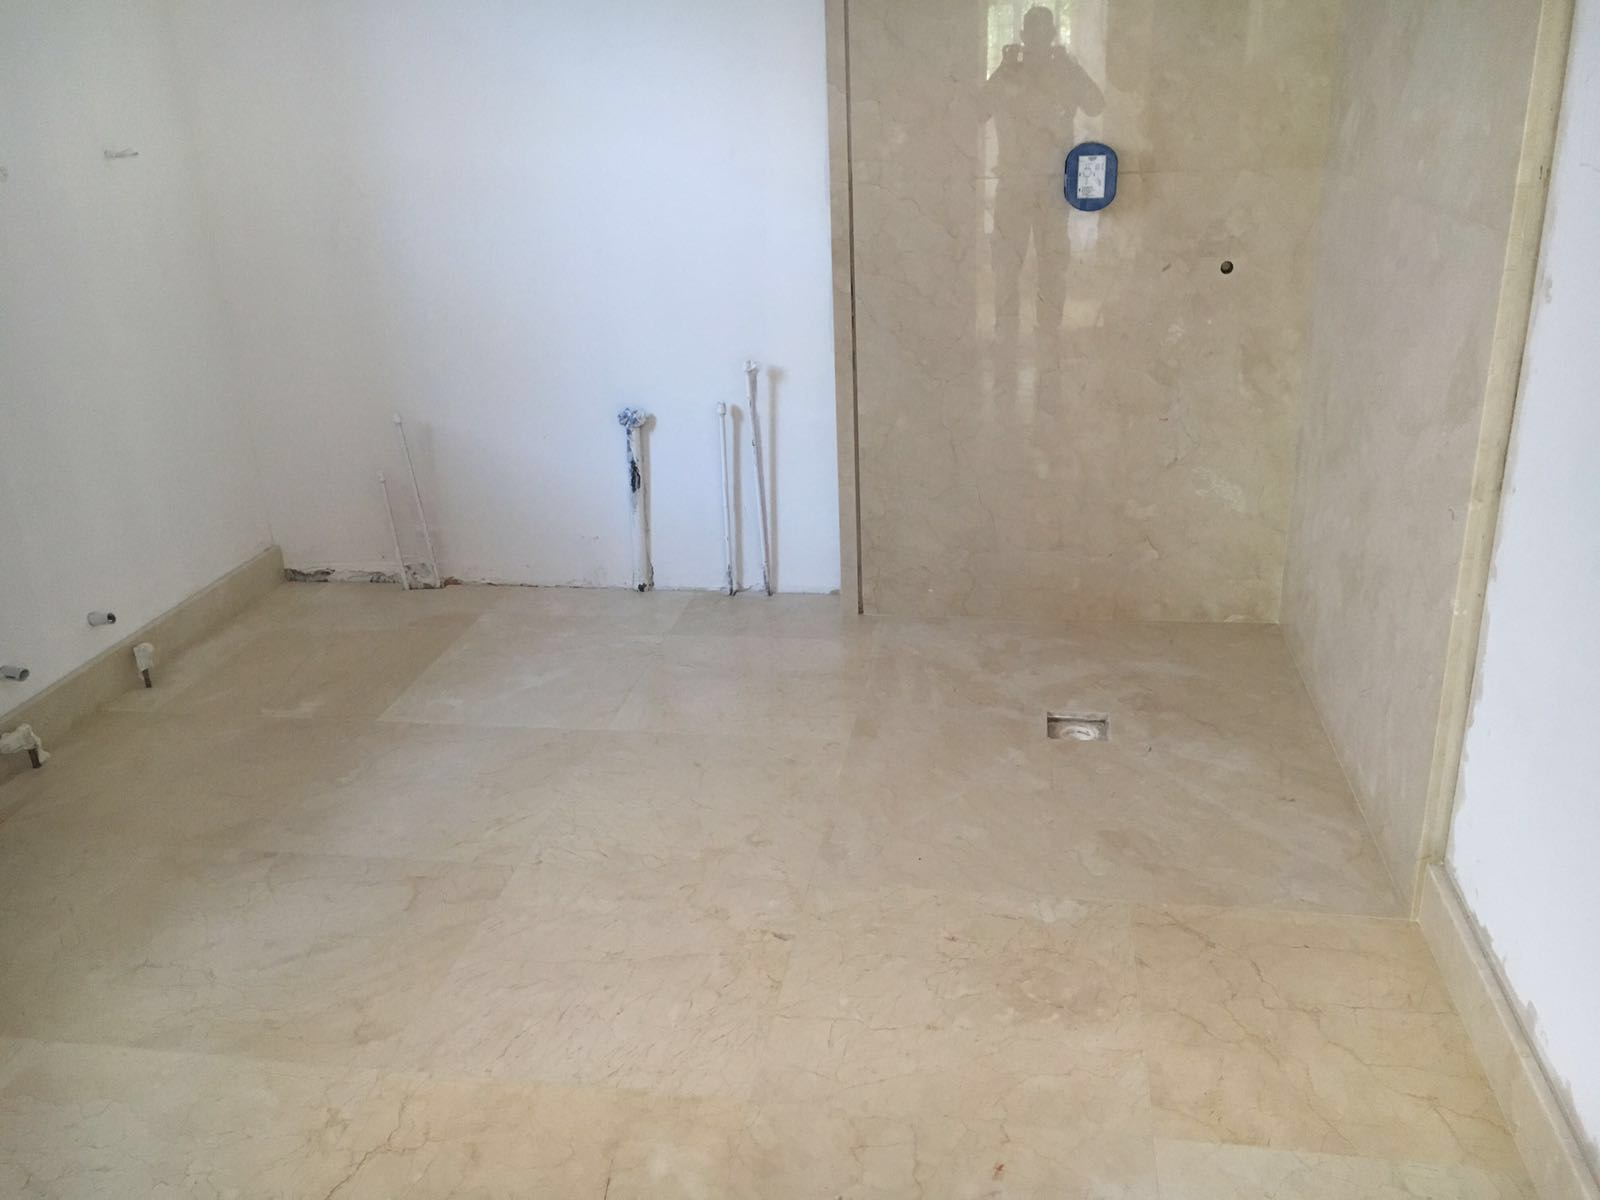 Crema Marfil bathroom cladding and flooring (4)